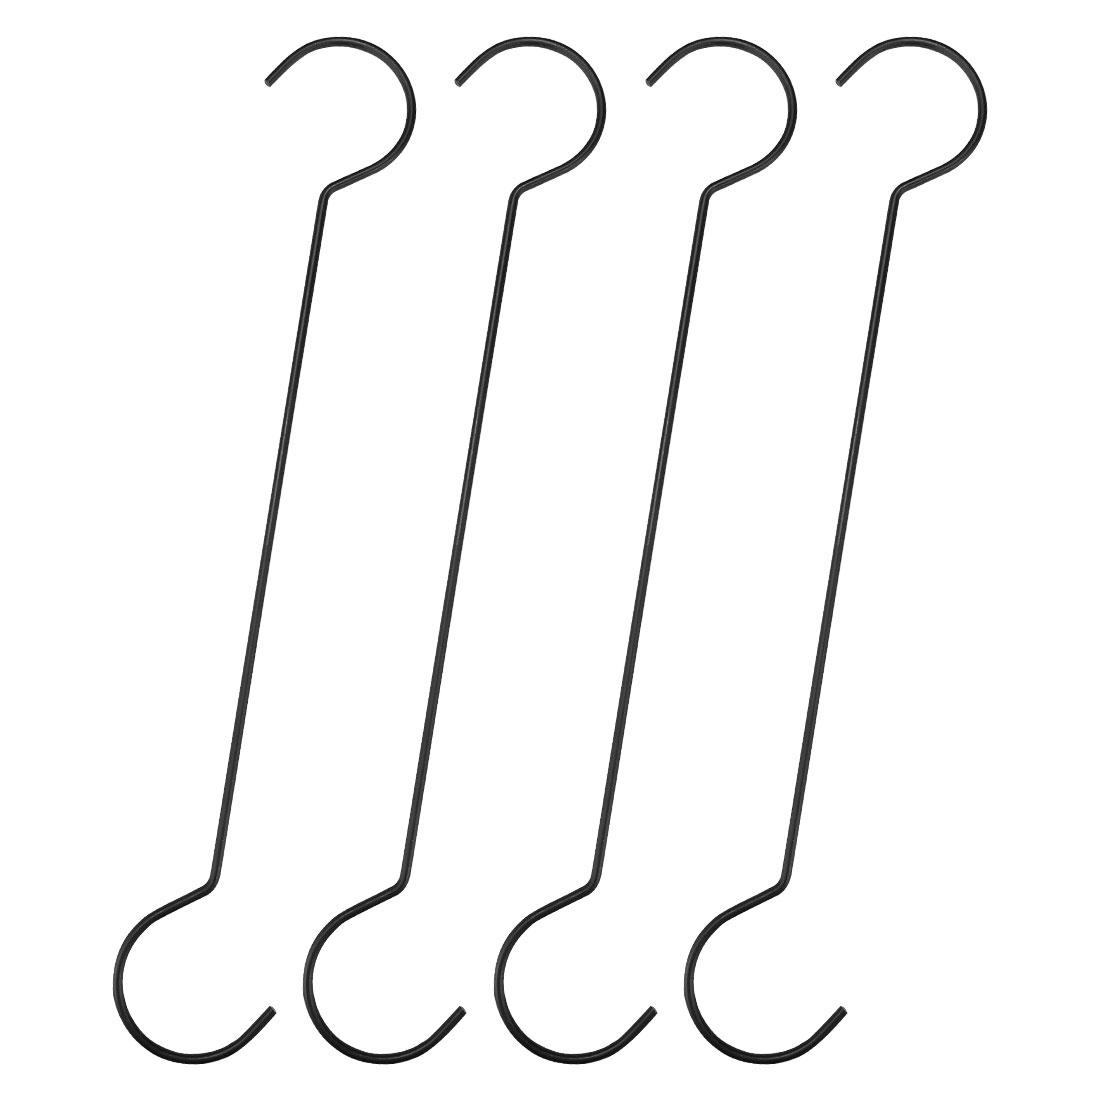 S Shape Hook Rack Metal for Hanging Plants Pots Coat Towel 4 Pack